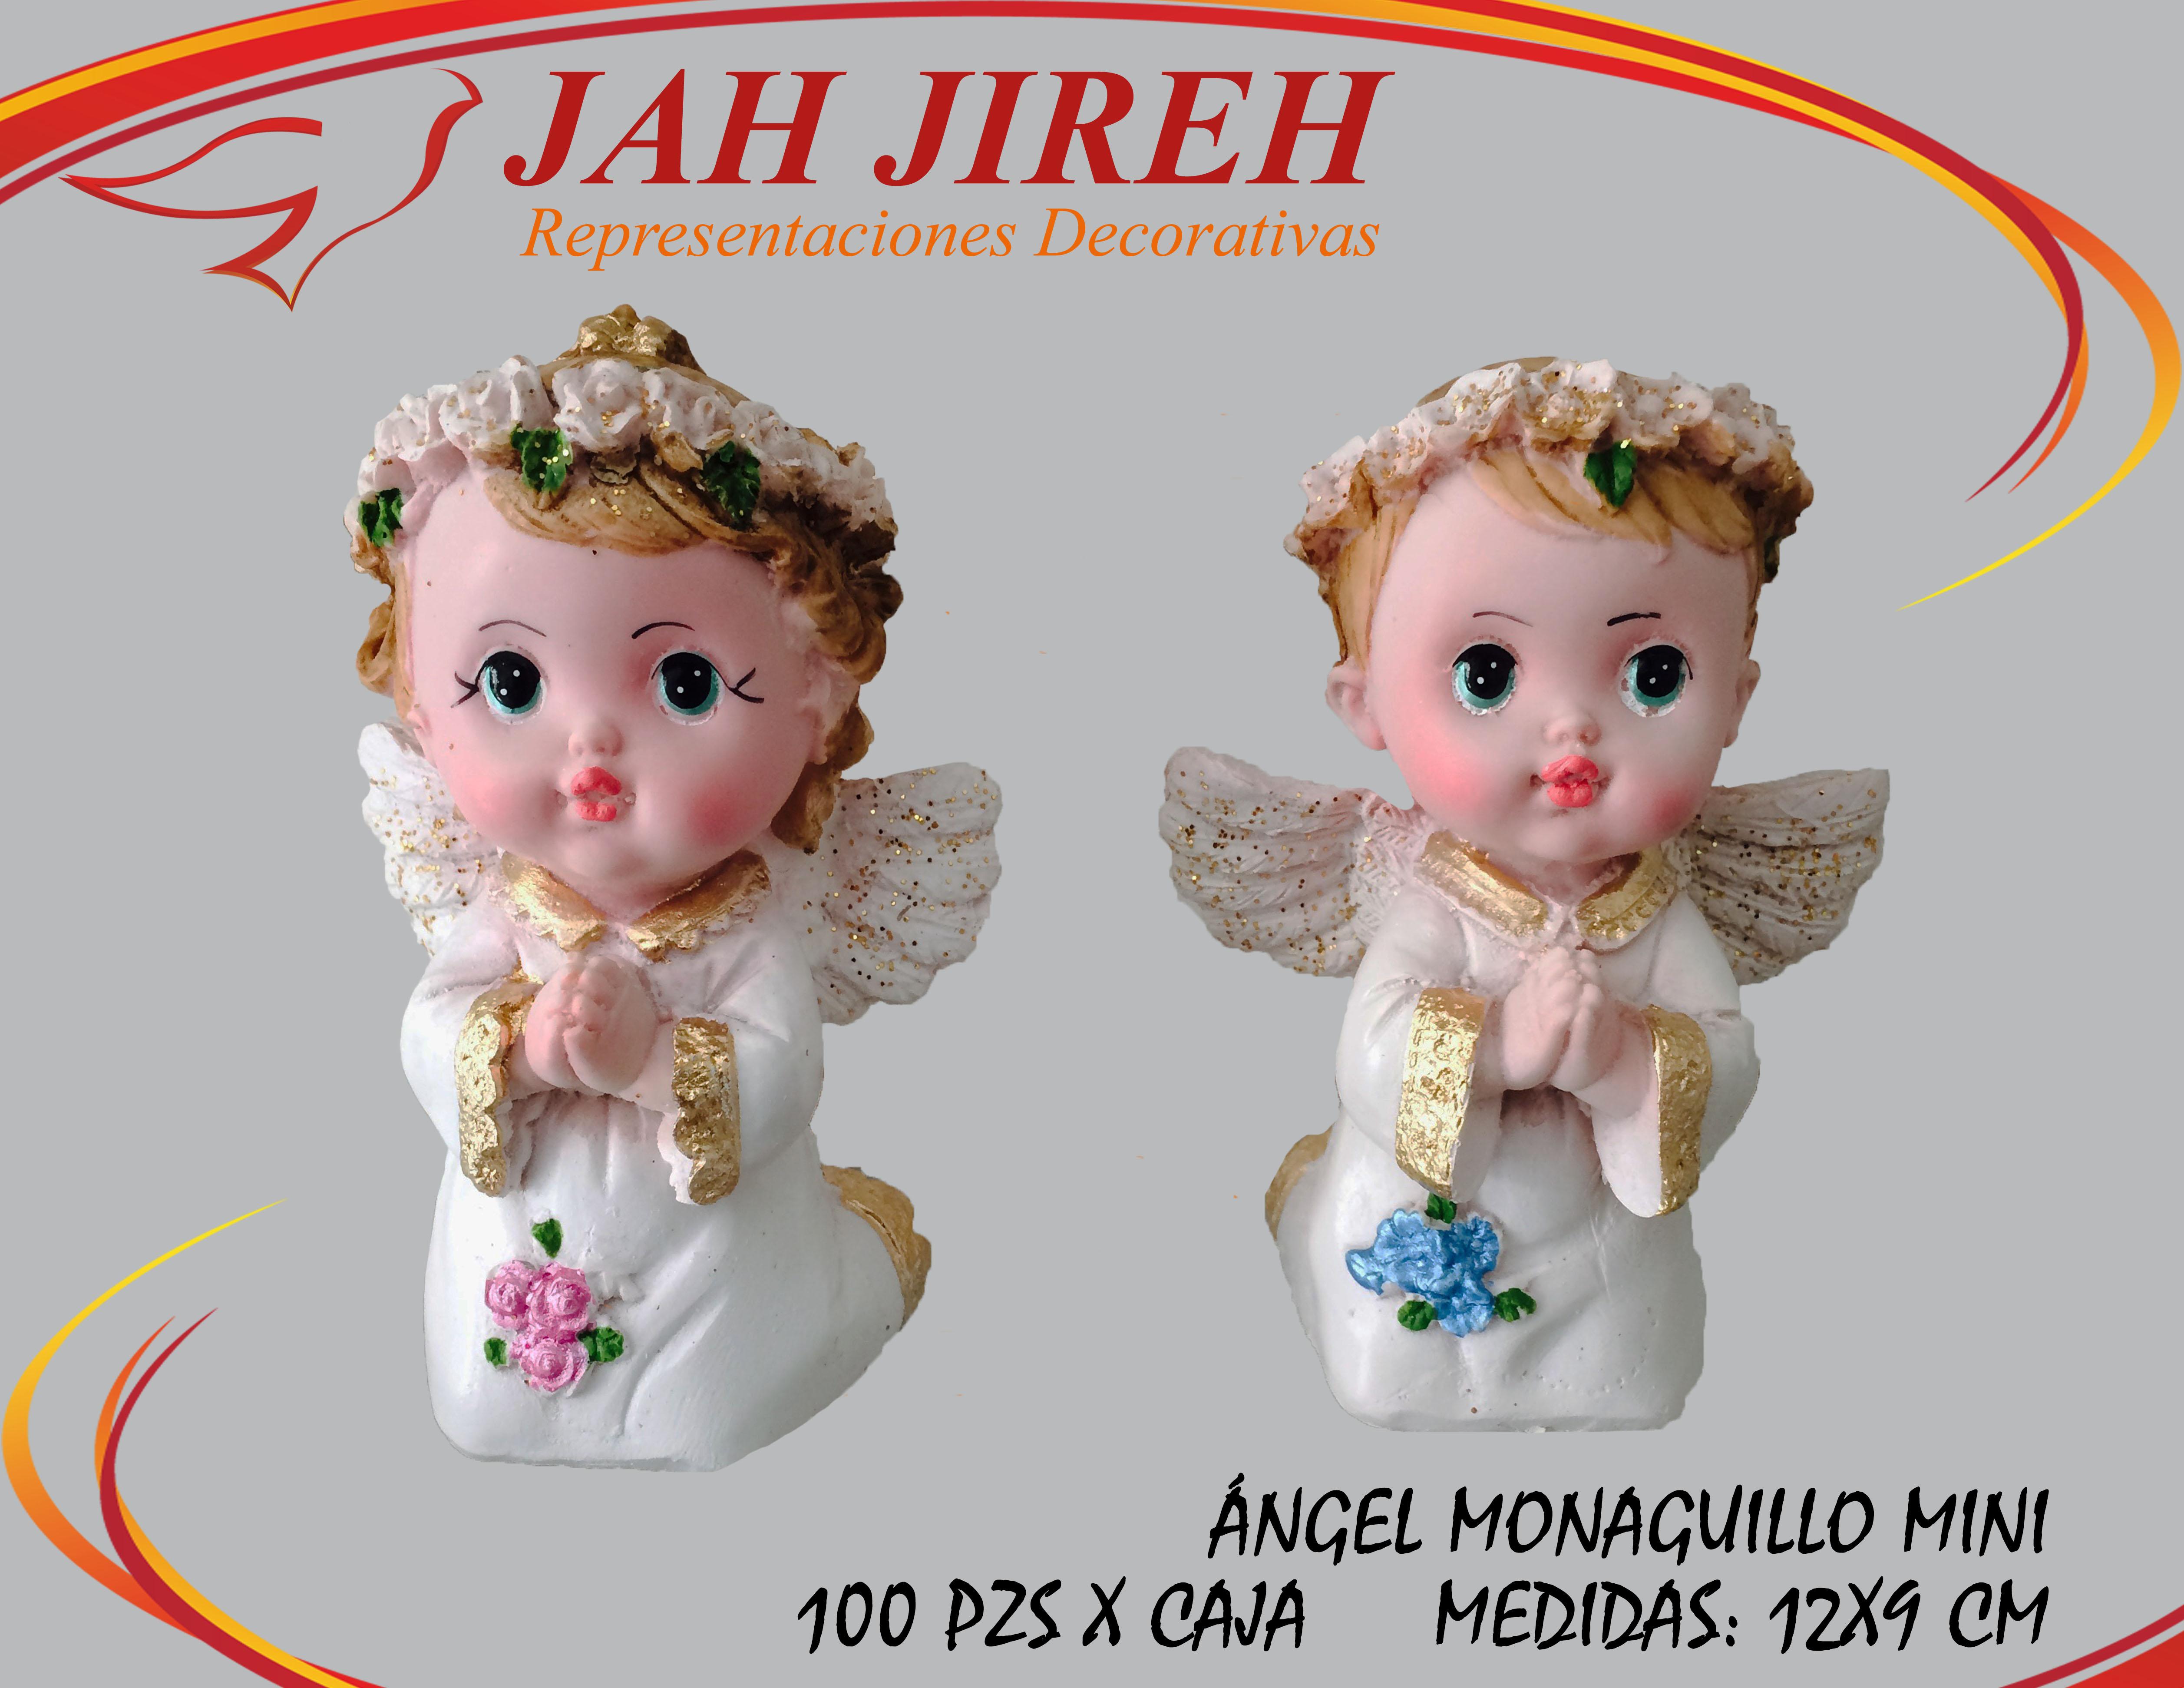 https://0201.nccdn.net/1_2/000/000/116/679/angel-monaguillo-mini.jpg